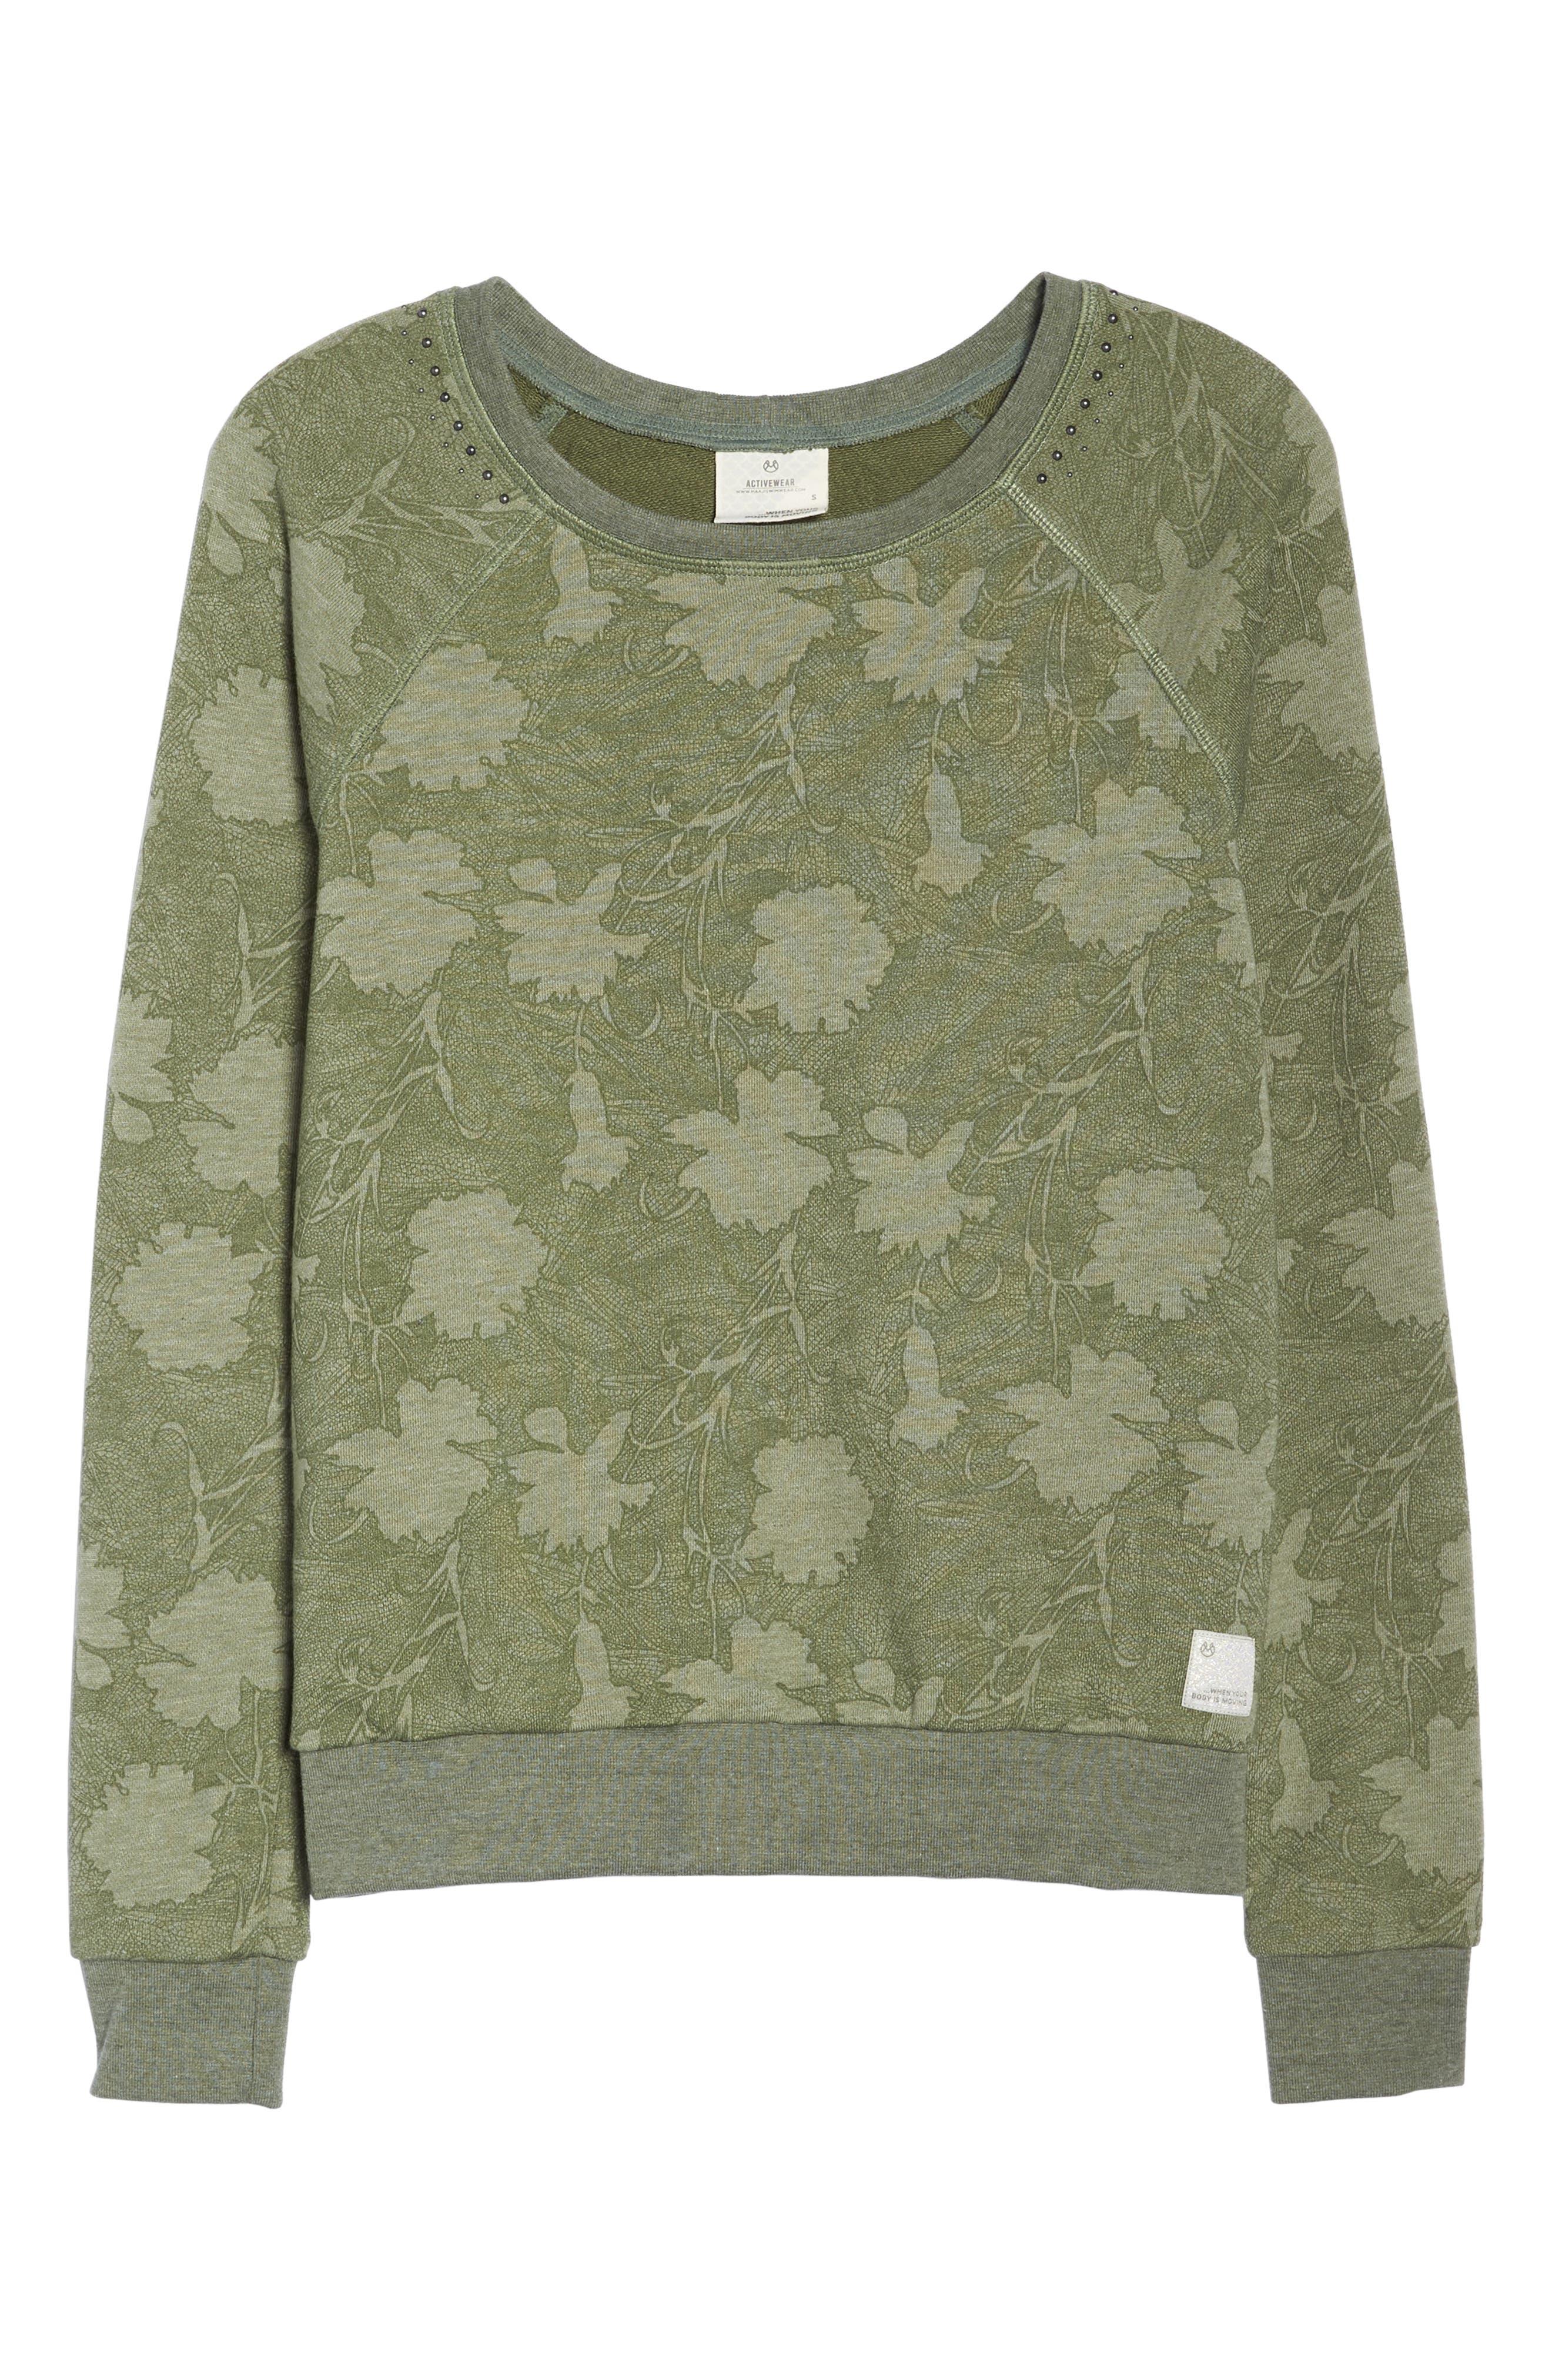 Sleek Leaf Kale Sweatshirt,                             Alternate thumbnail 7, color,                             GREEN